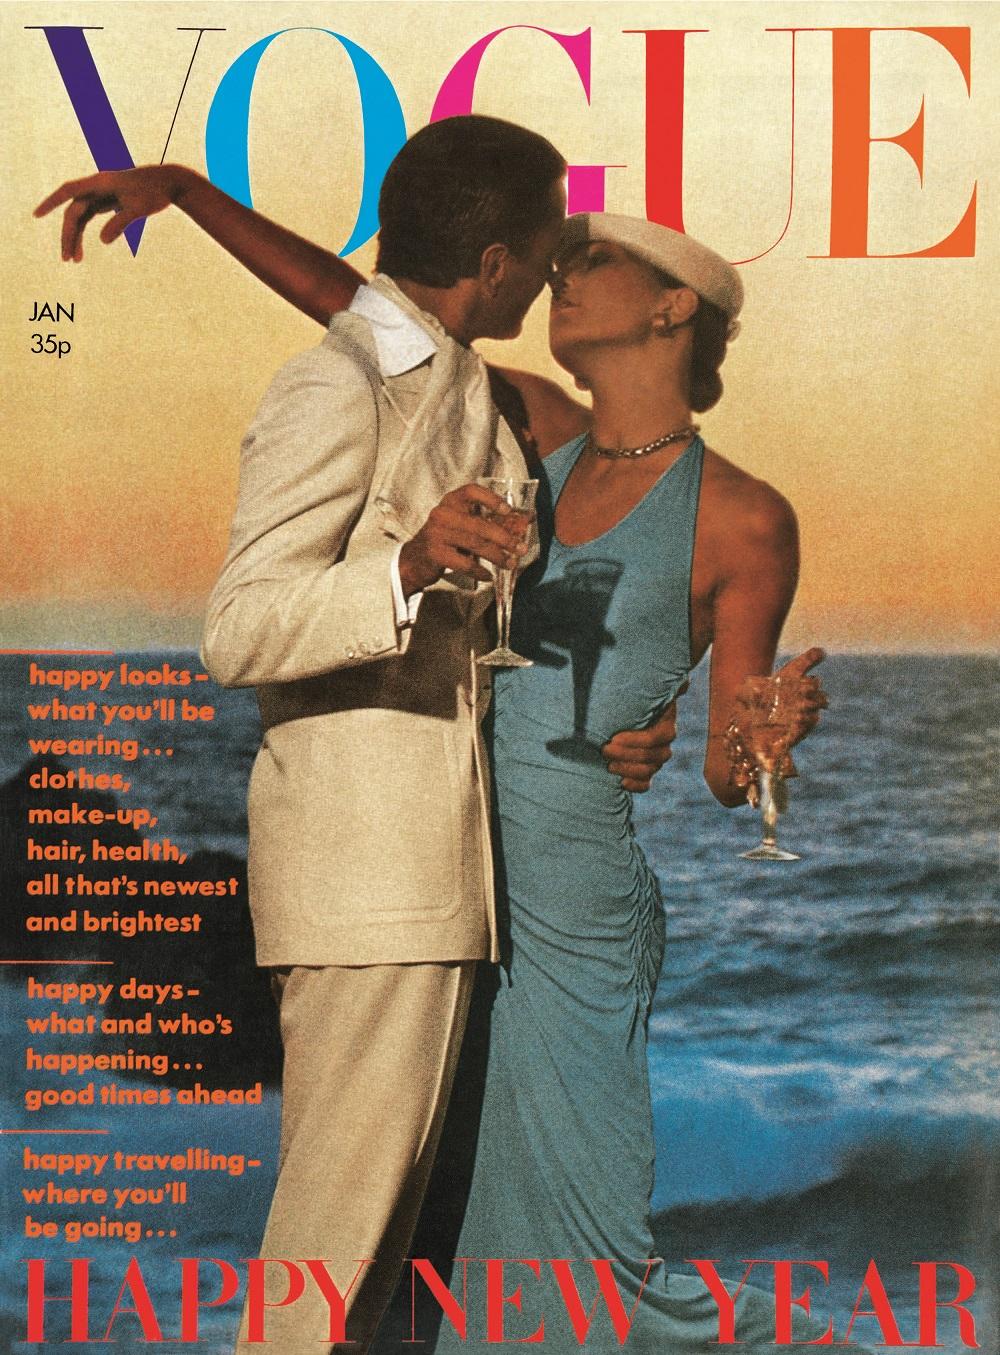 British Vogue Cover January 1974